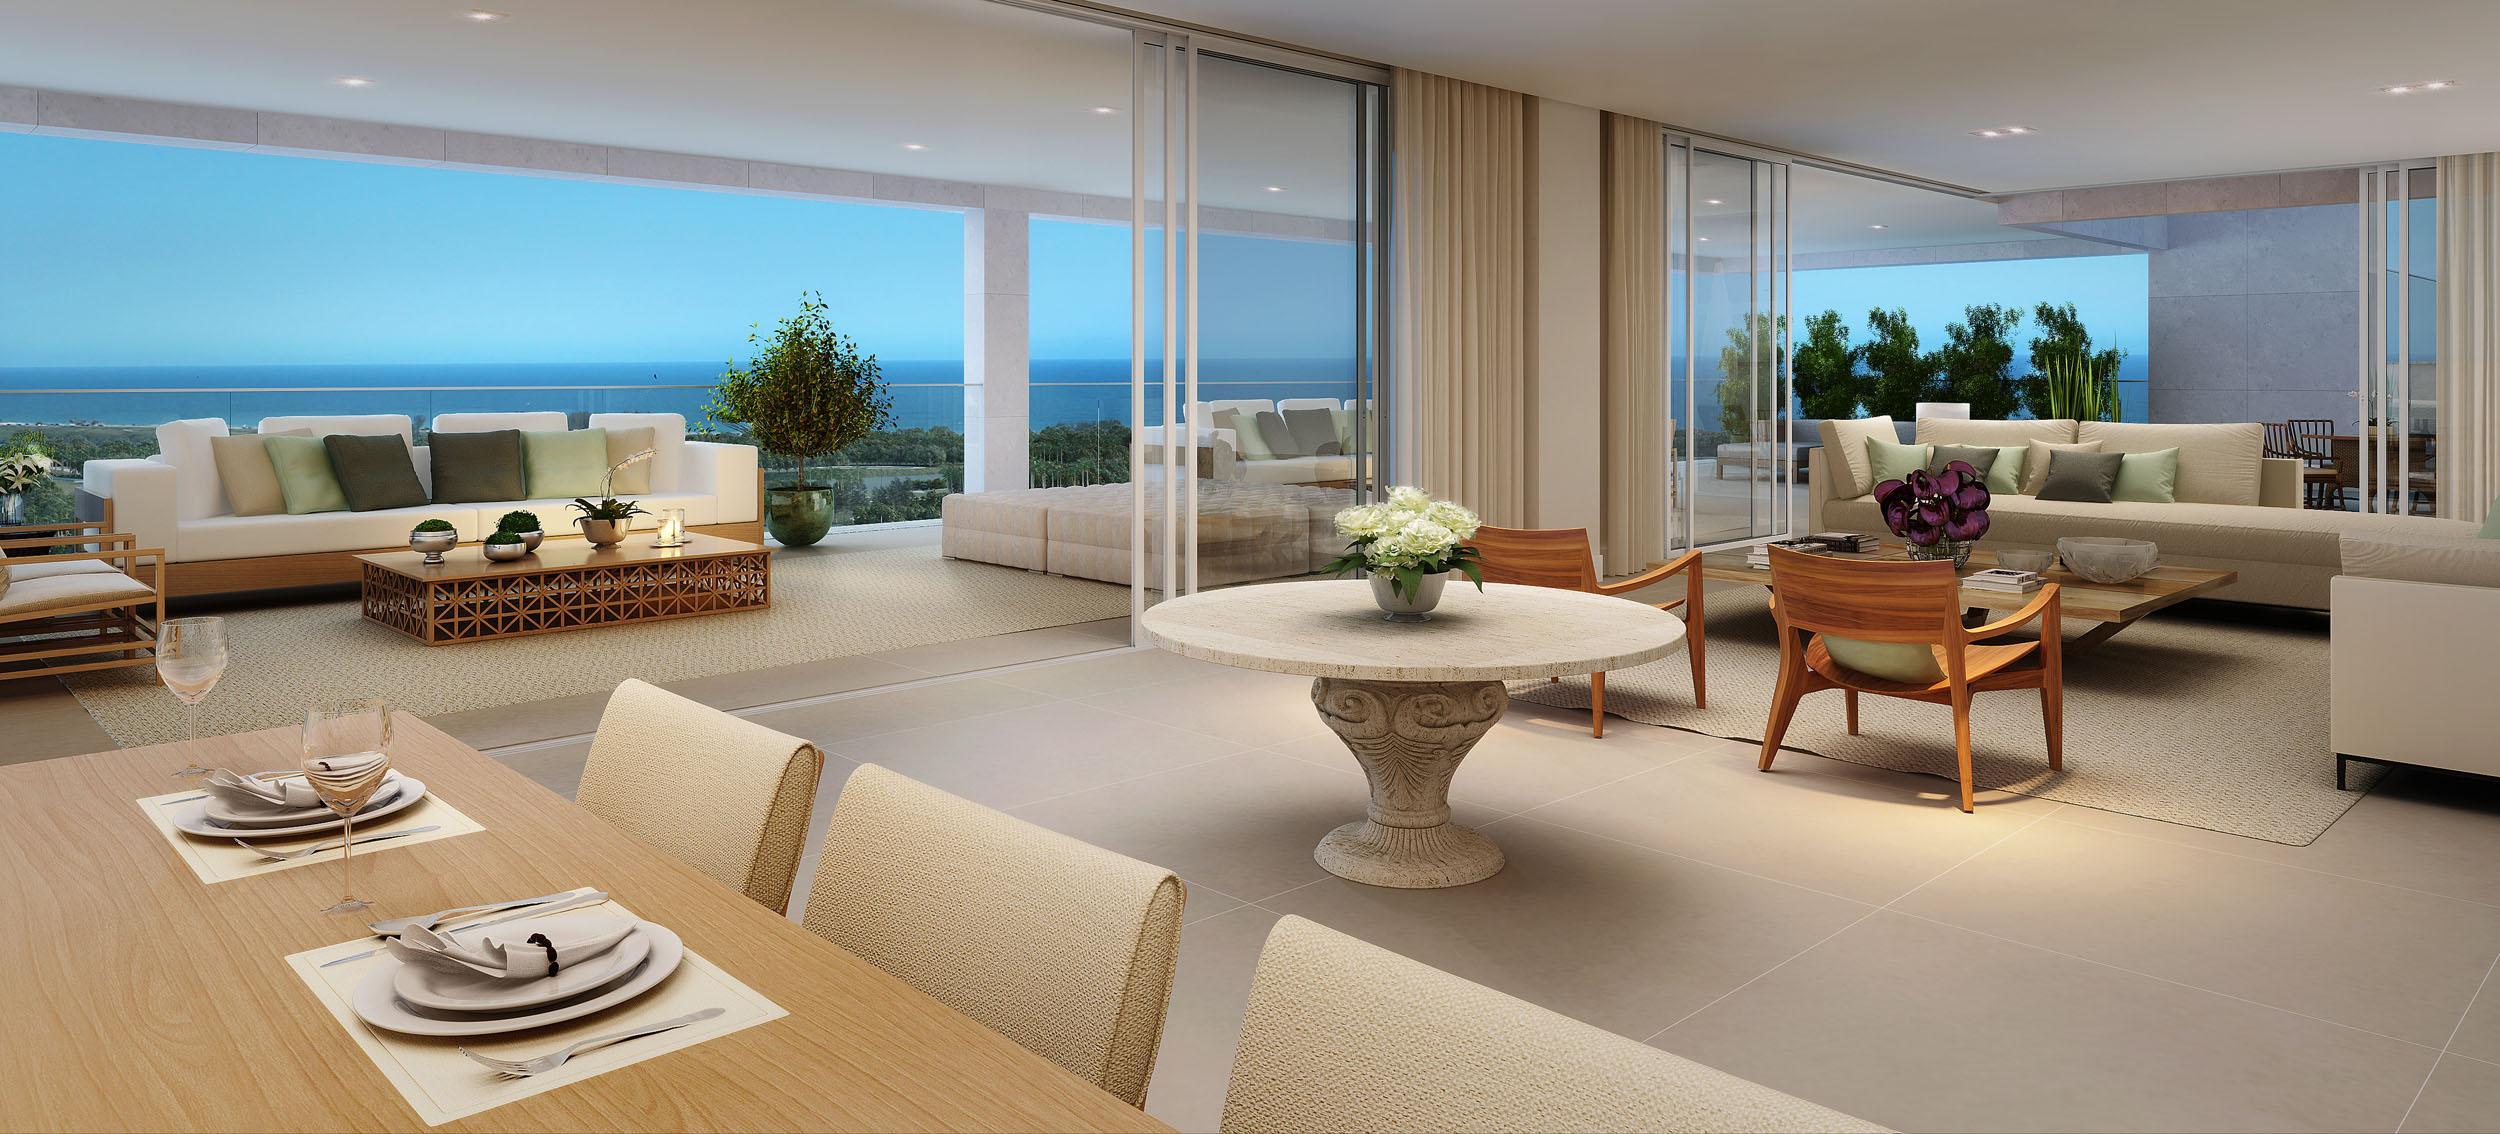 Fachada | Riserva Golf Vista Mare Residenziale – Apartamentona  Barra da Tijuca - Rio de Janeiro - Rio de Janeiro